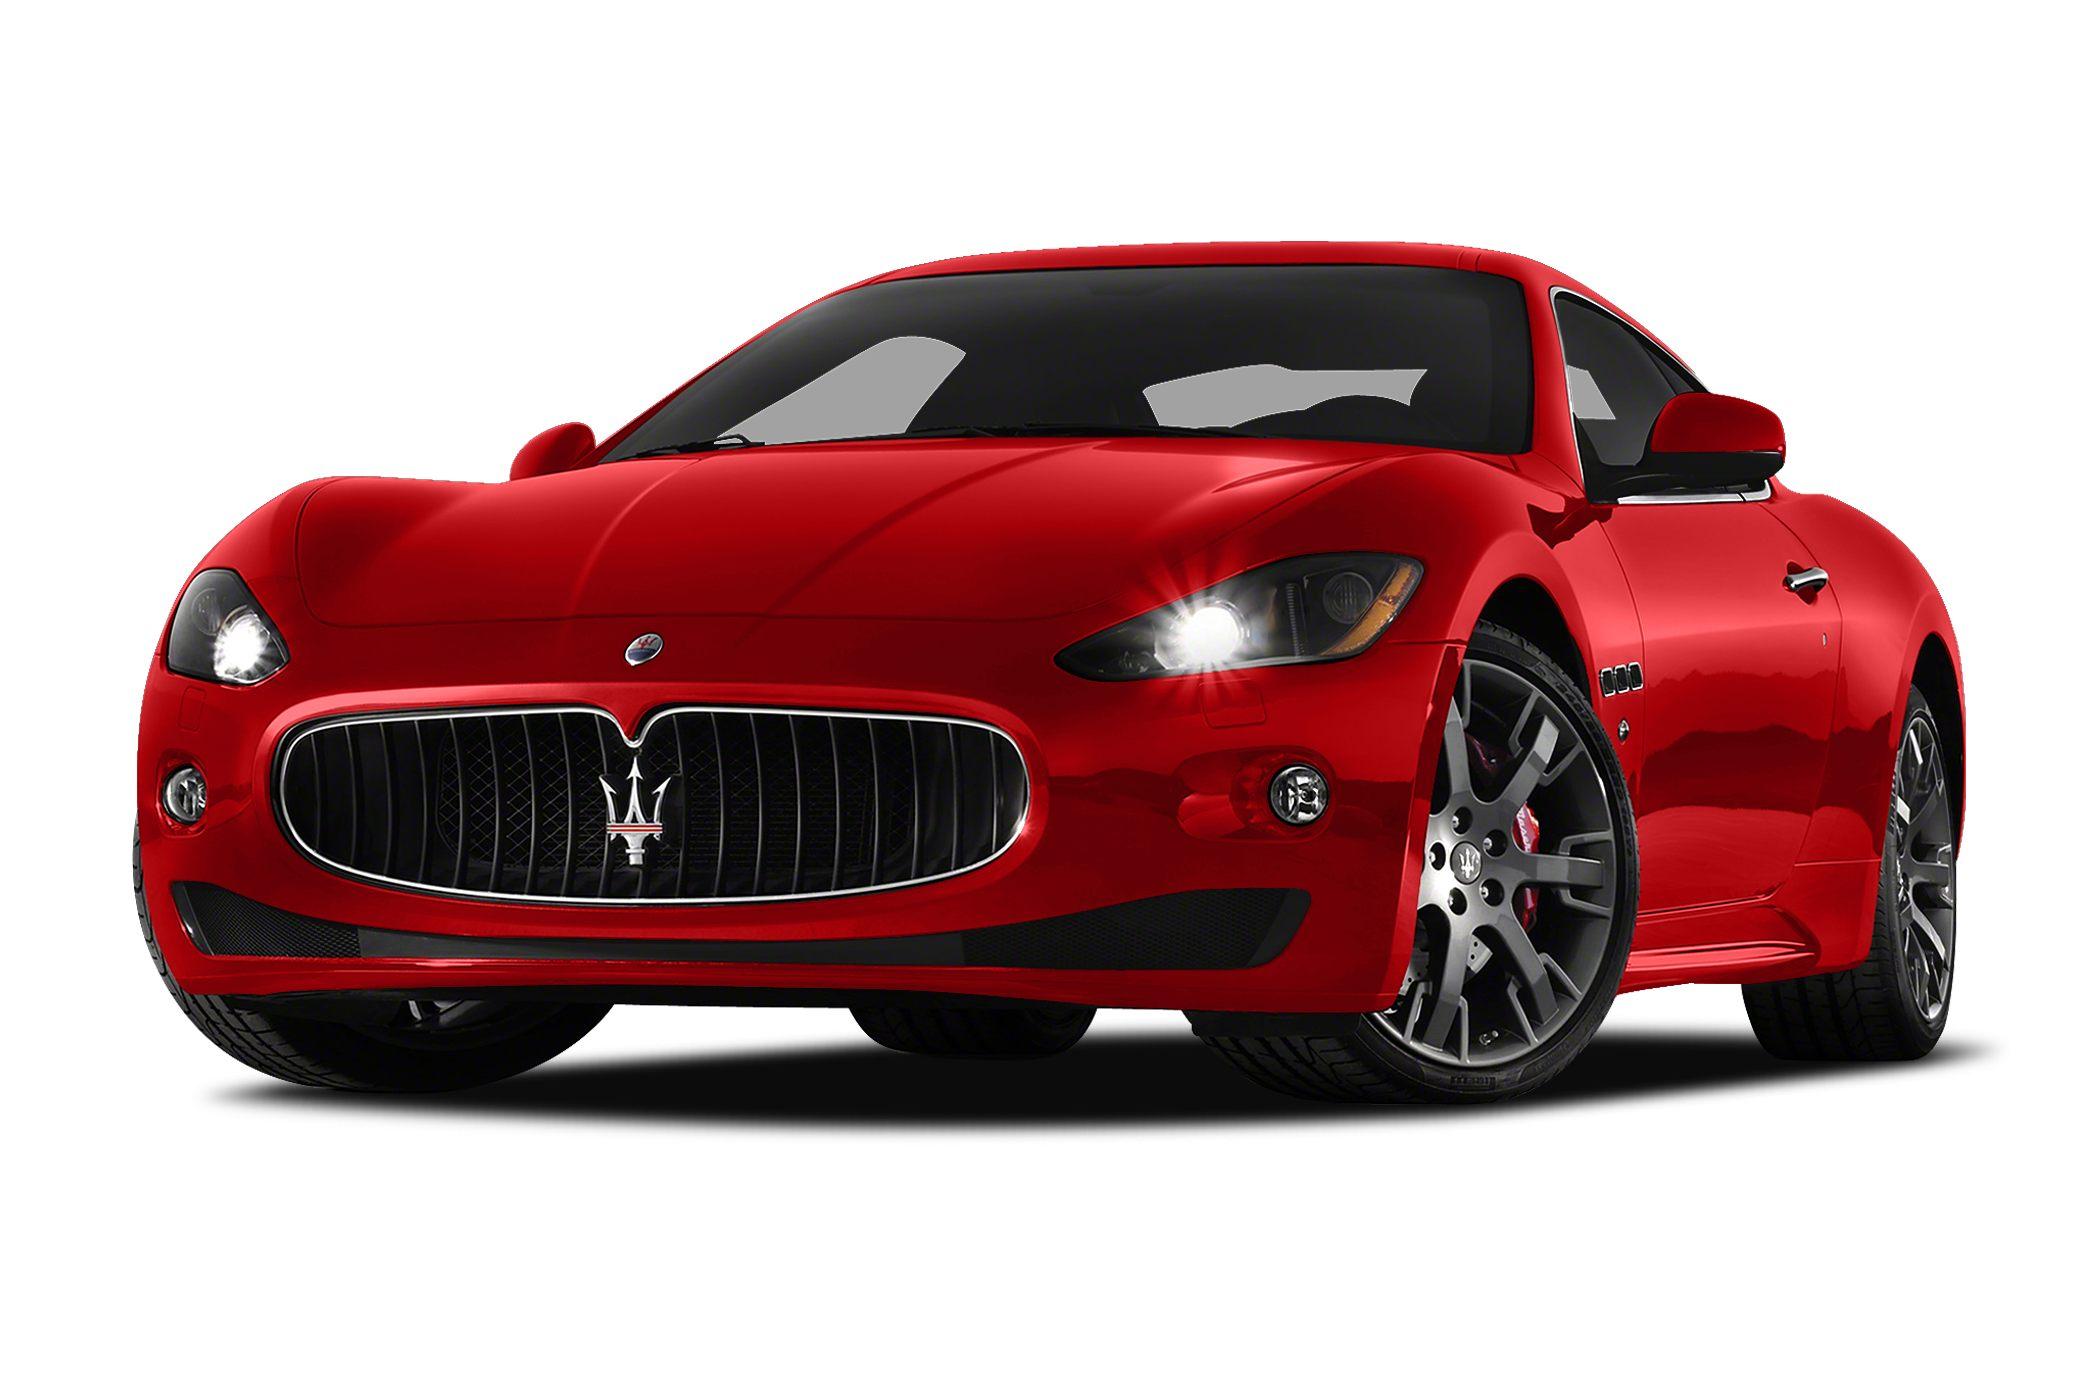 2010 Maserati GranTurismo